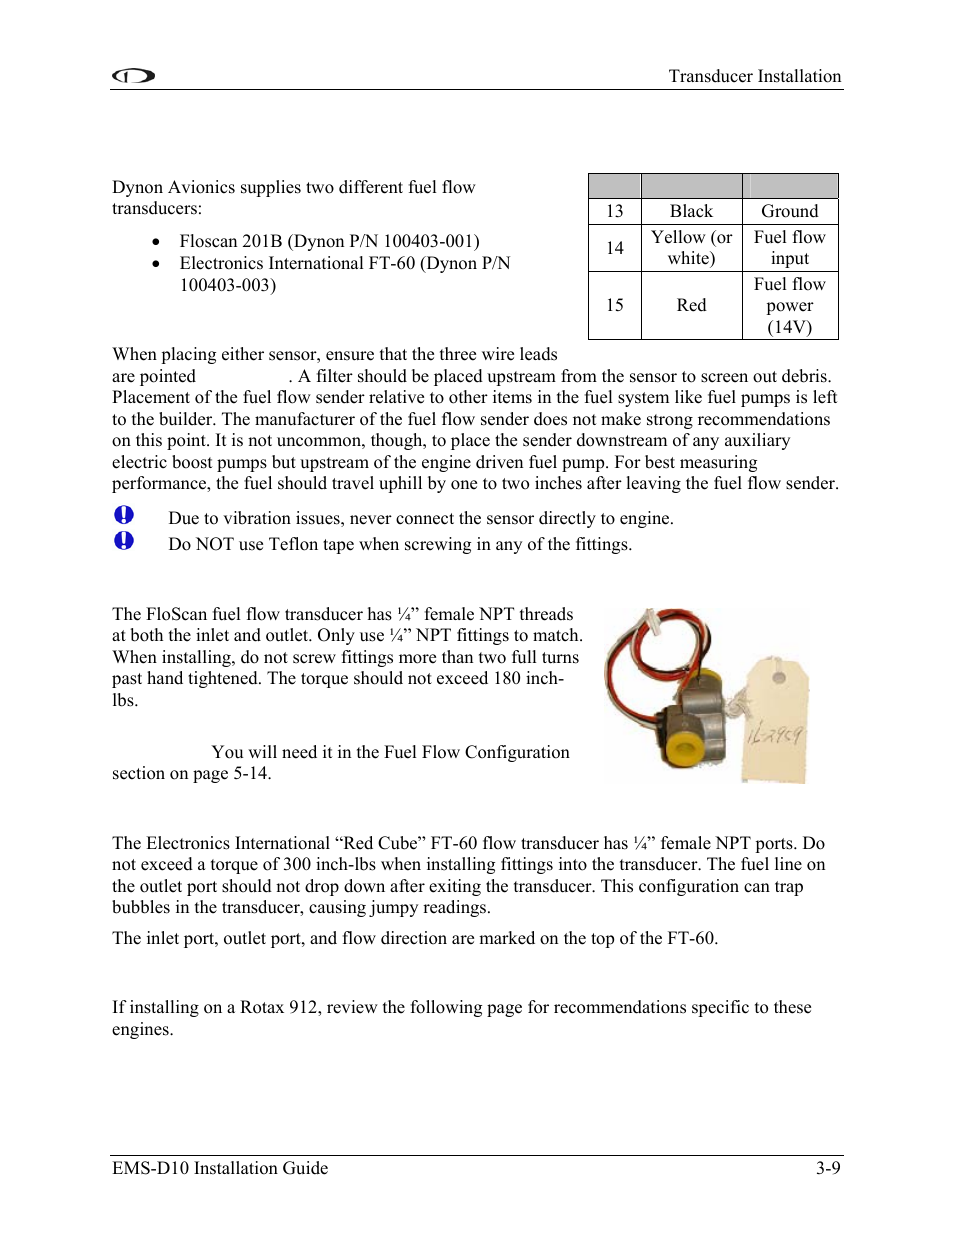 fuel flow sensor general placement recommendations floscan rh manualsdir com User Manual Template Instruction Manual Example